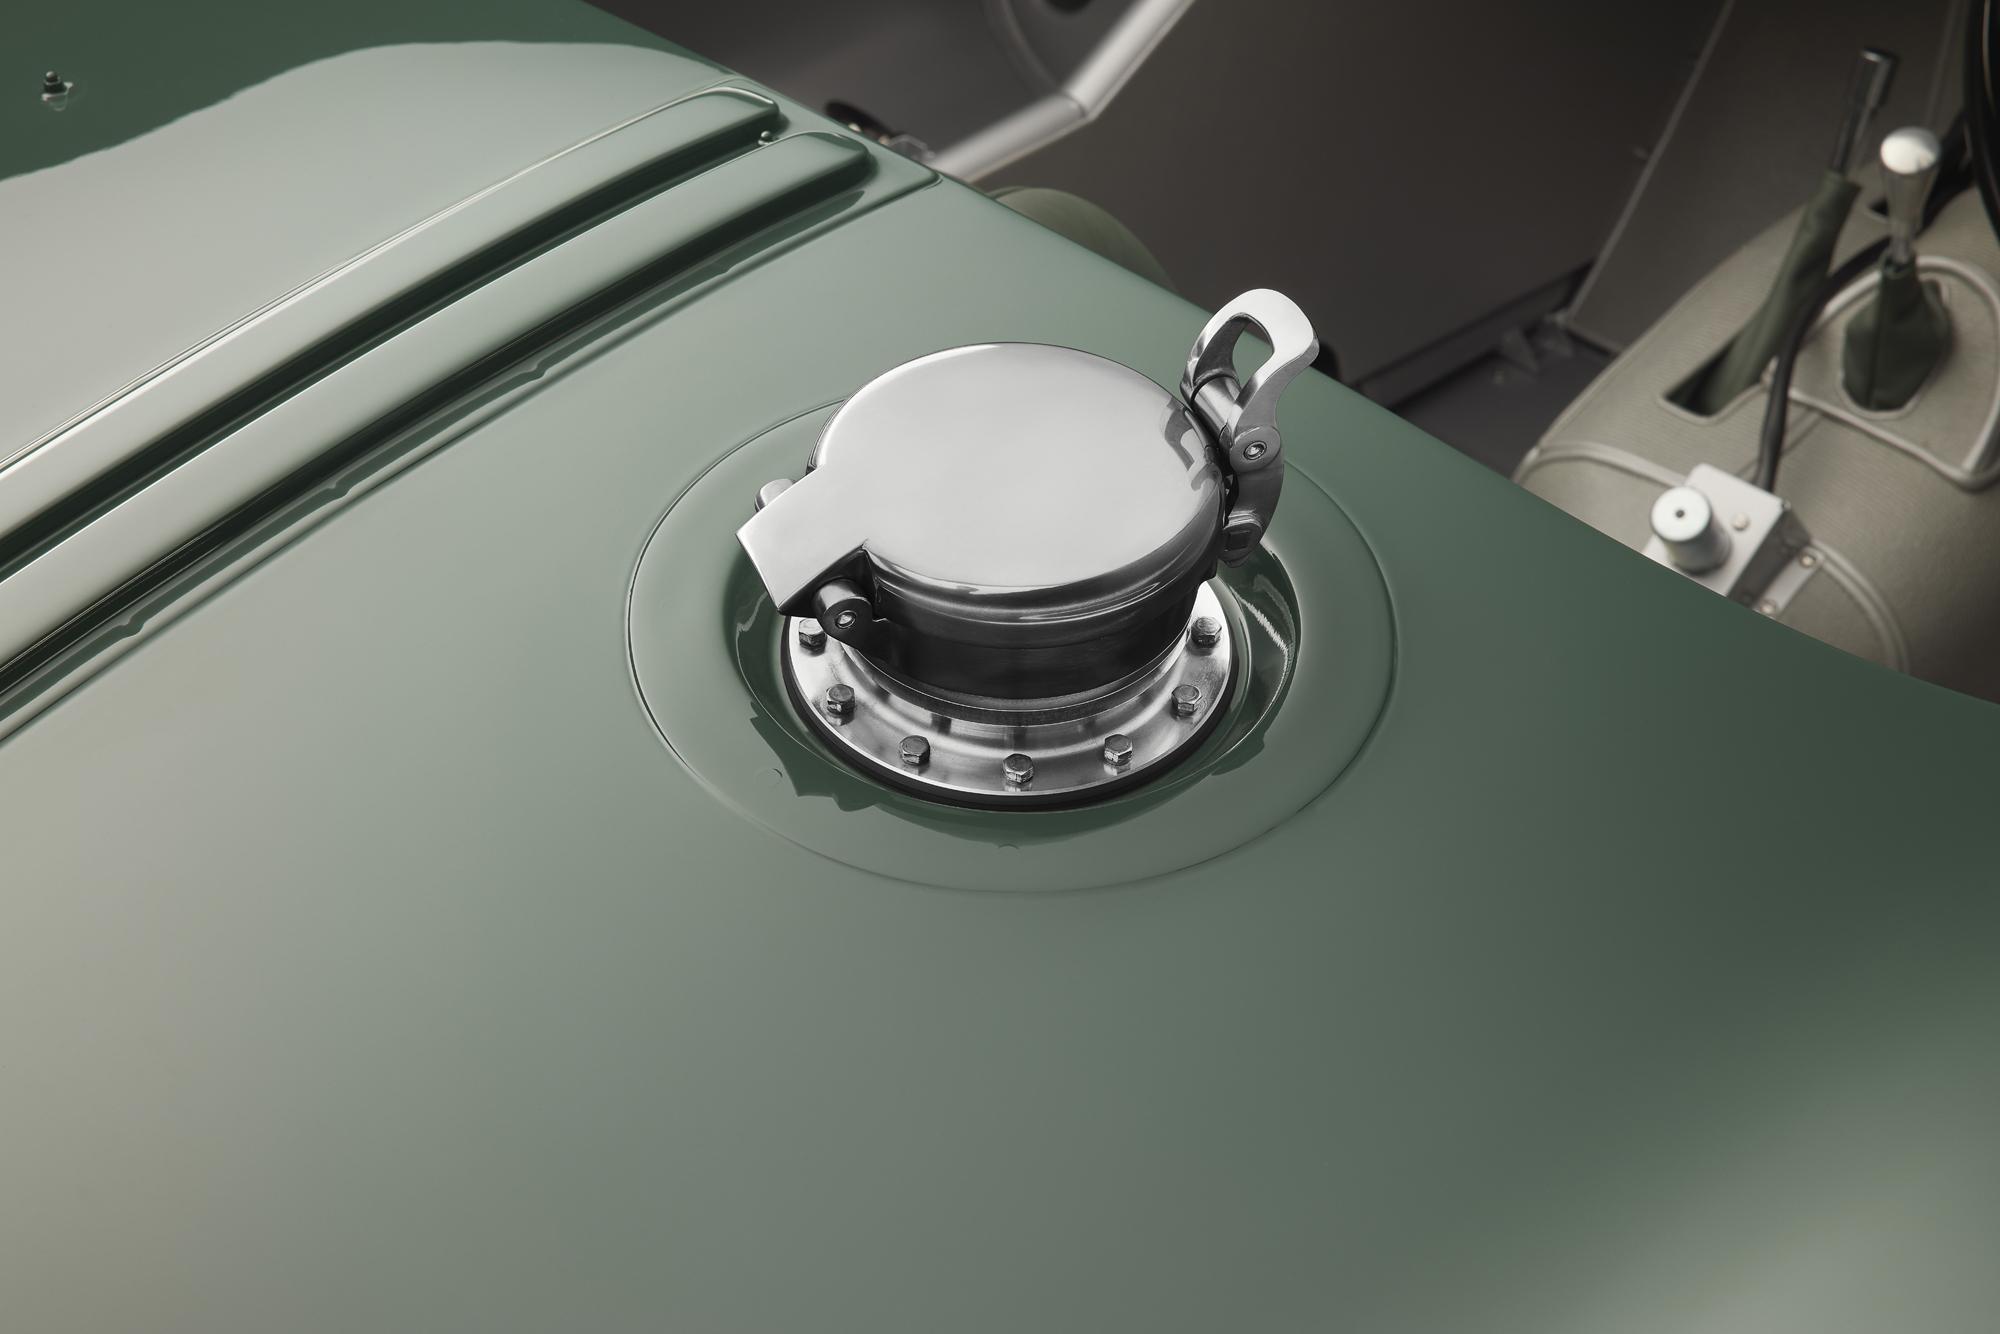 Jaguar C-type continuation filler